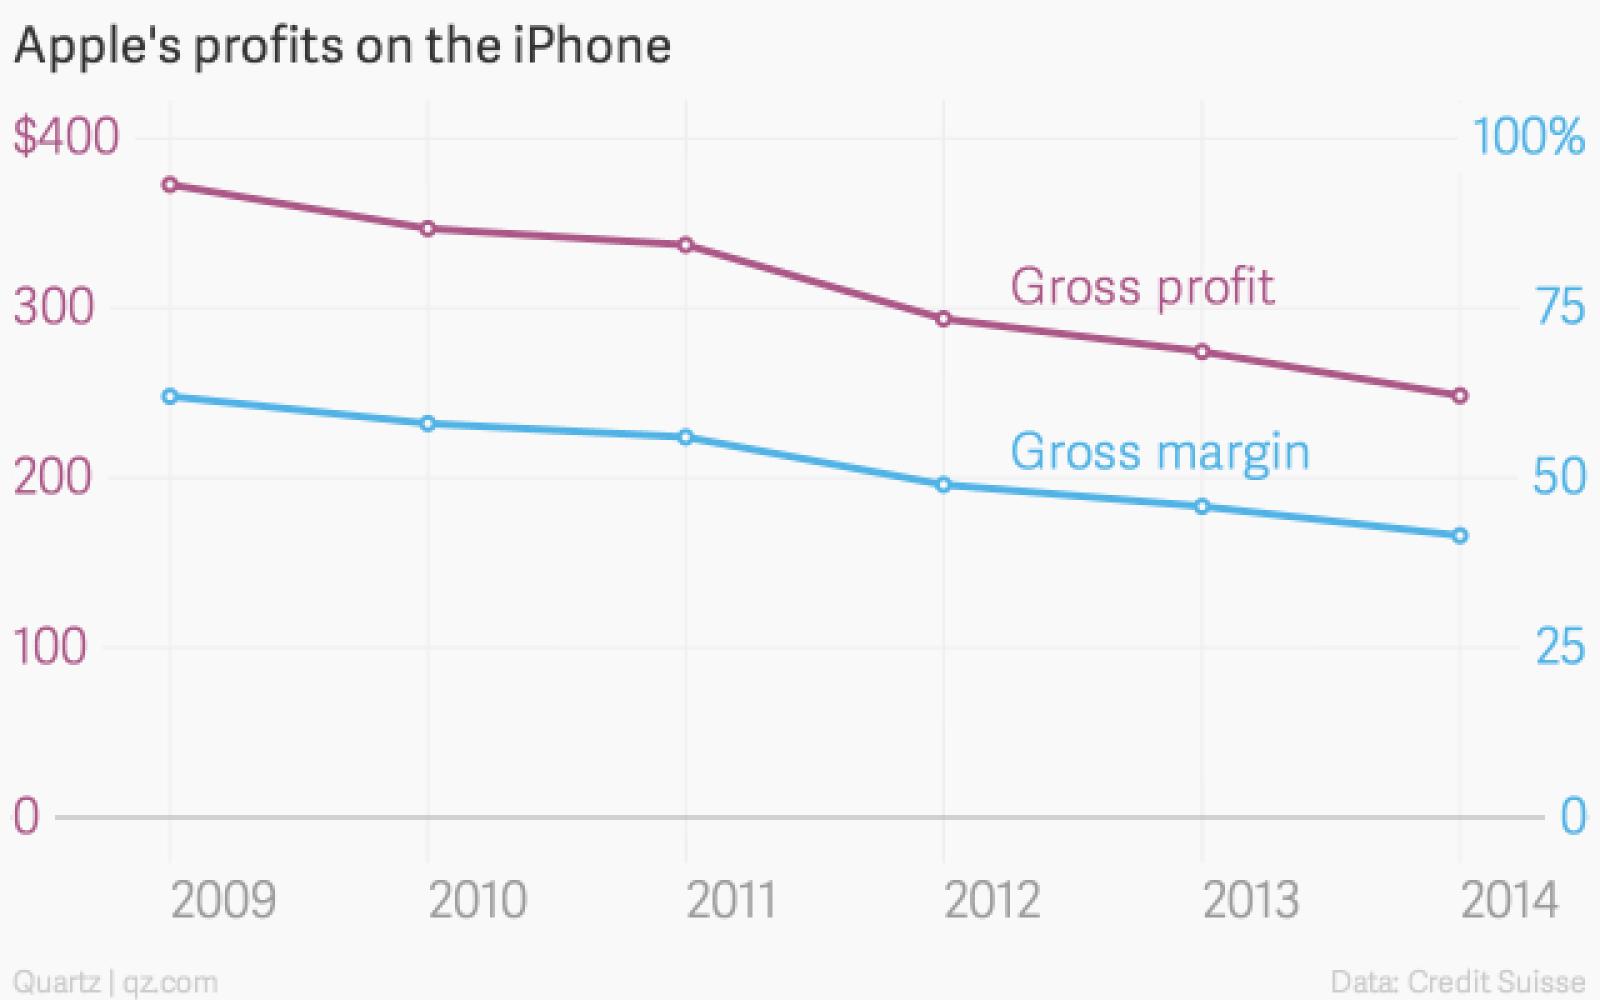 credit suisse estimates iphone 6 earns lowest ever margins but